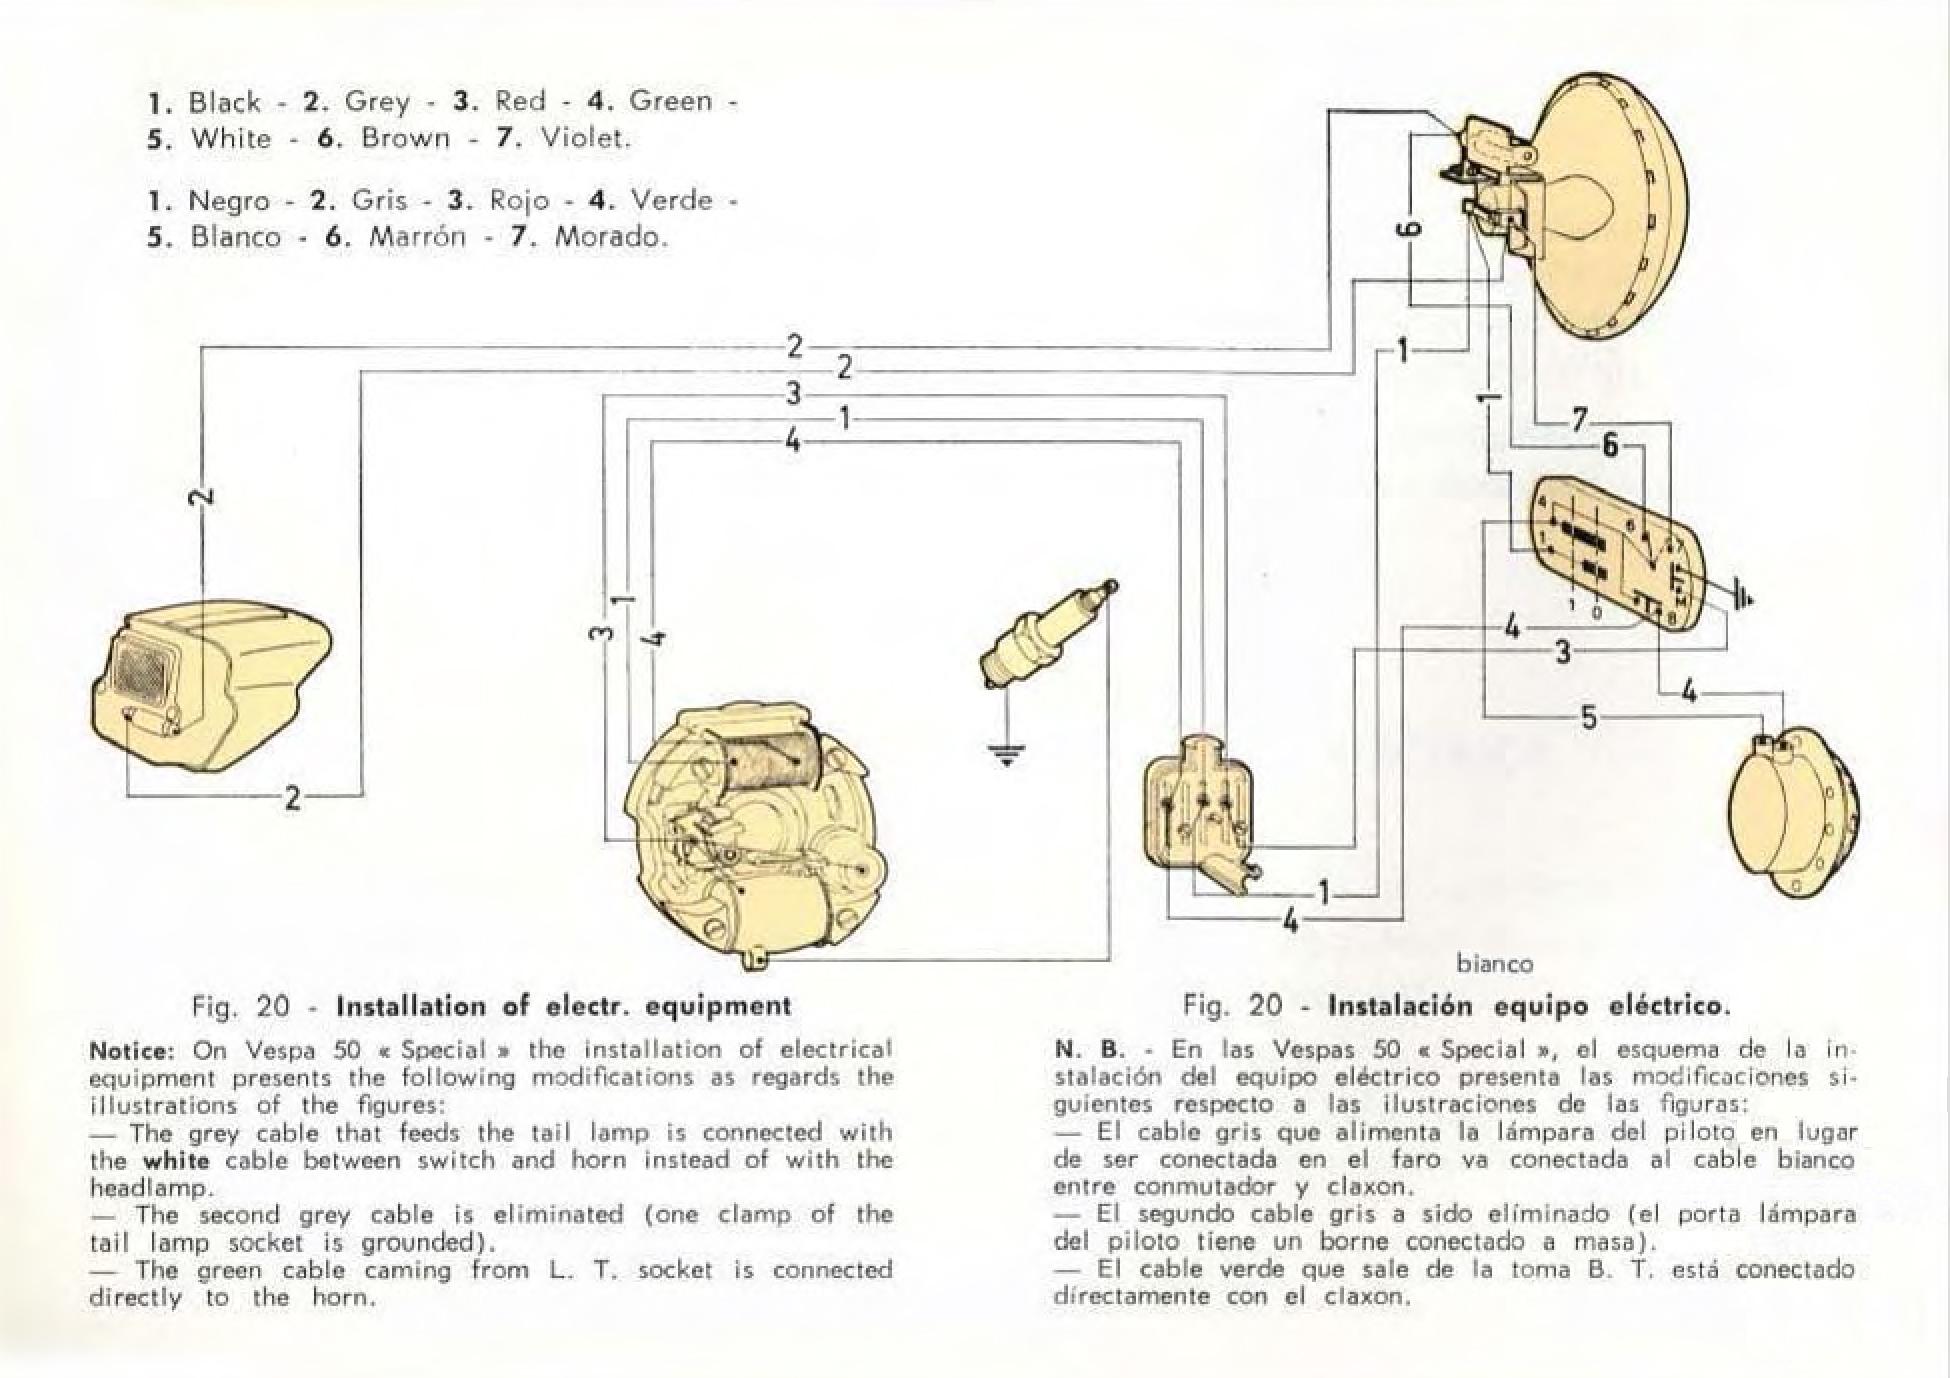 Et2 Lighting Wiring Diagram Vespa Detailed Diagrams Rh Standrewsthorntonheath Co Uk Basic Electrical Home